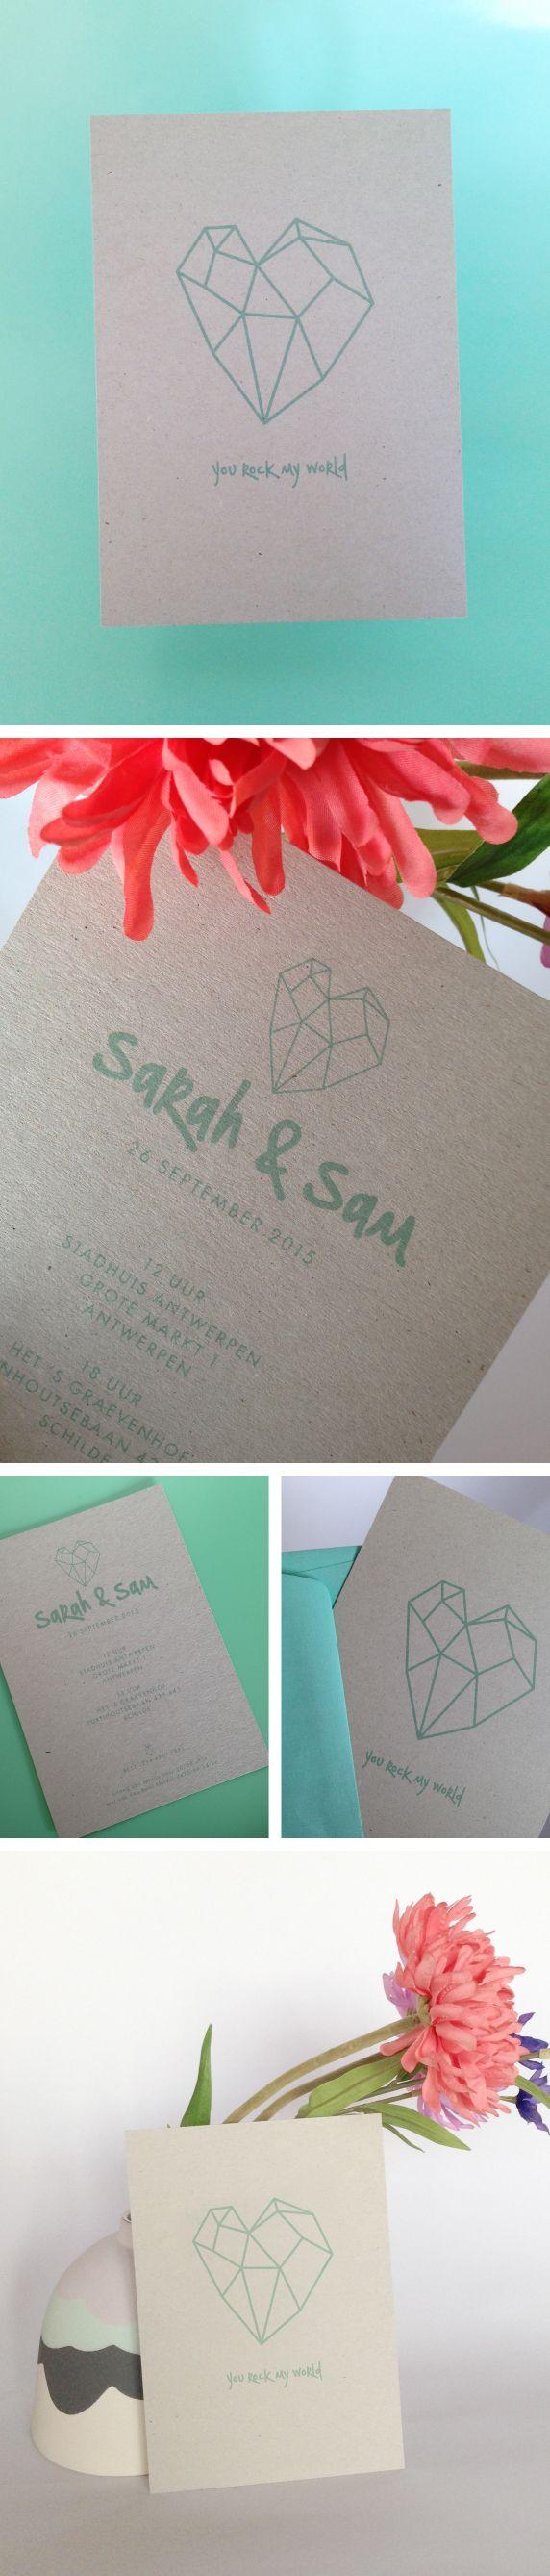 hart, mint green, heart, love, invitation, recycled paper, trouwuitnodiging, muntgroen